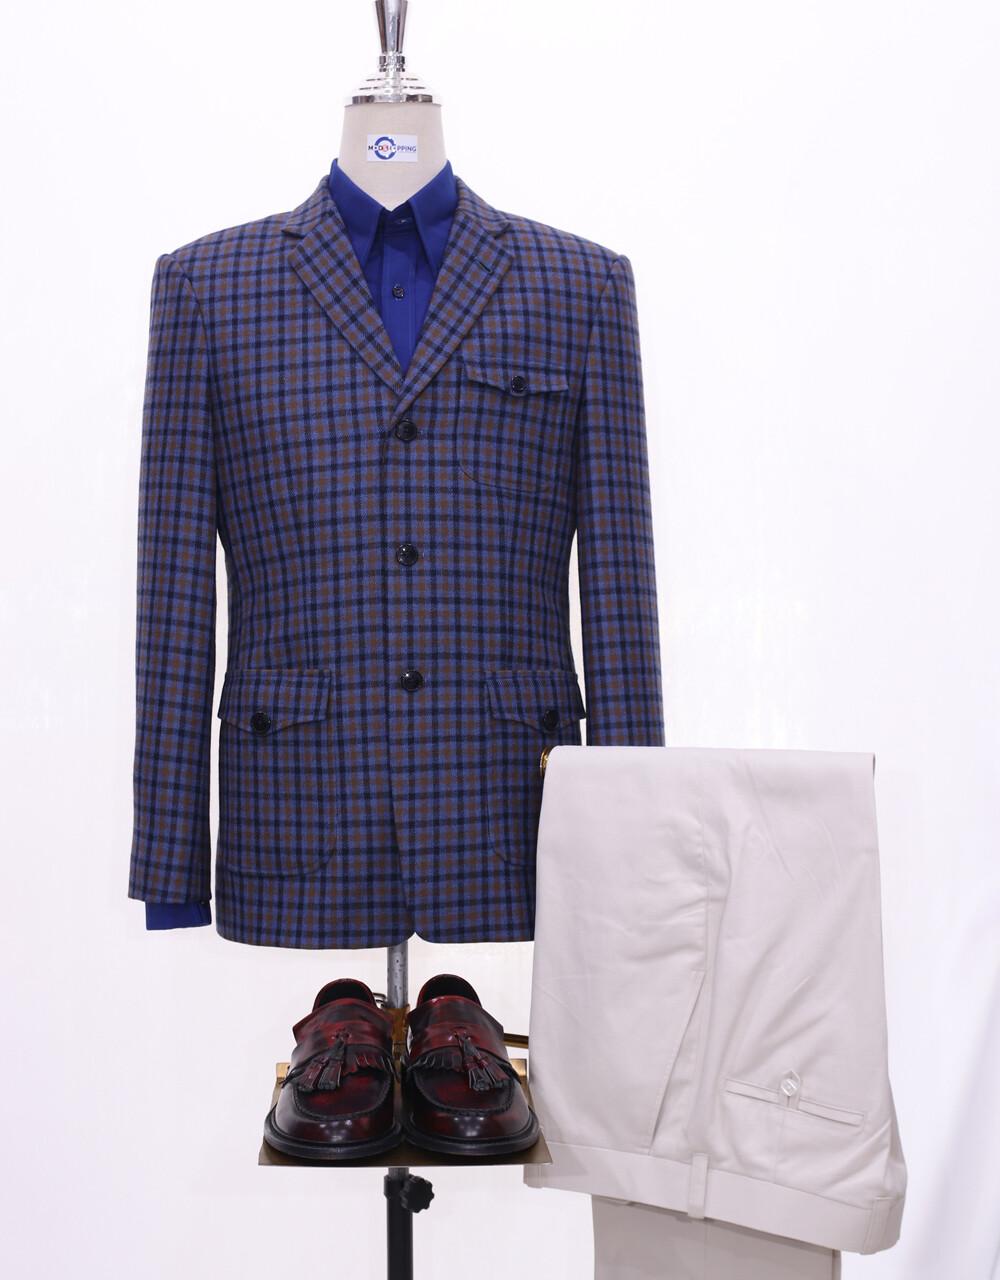 Tweed Jacket | Navy Blue Gingham Check 60s Style Jacket